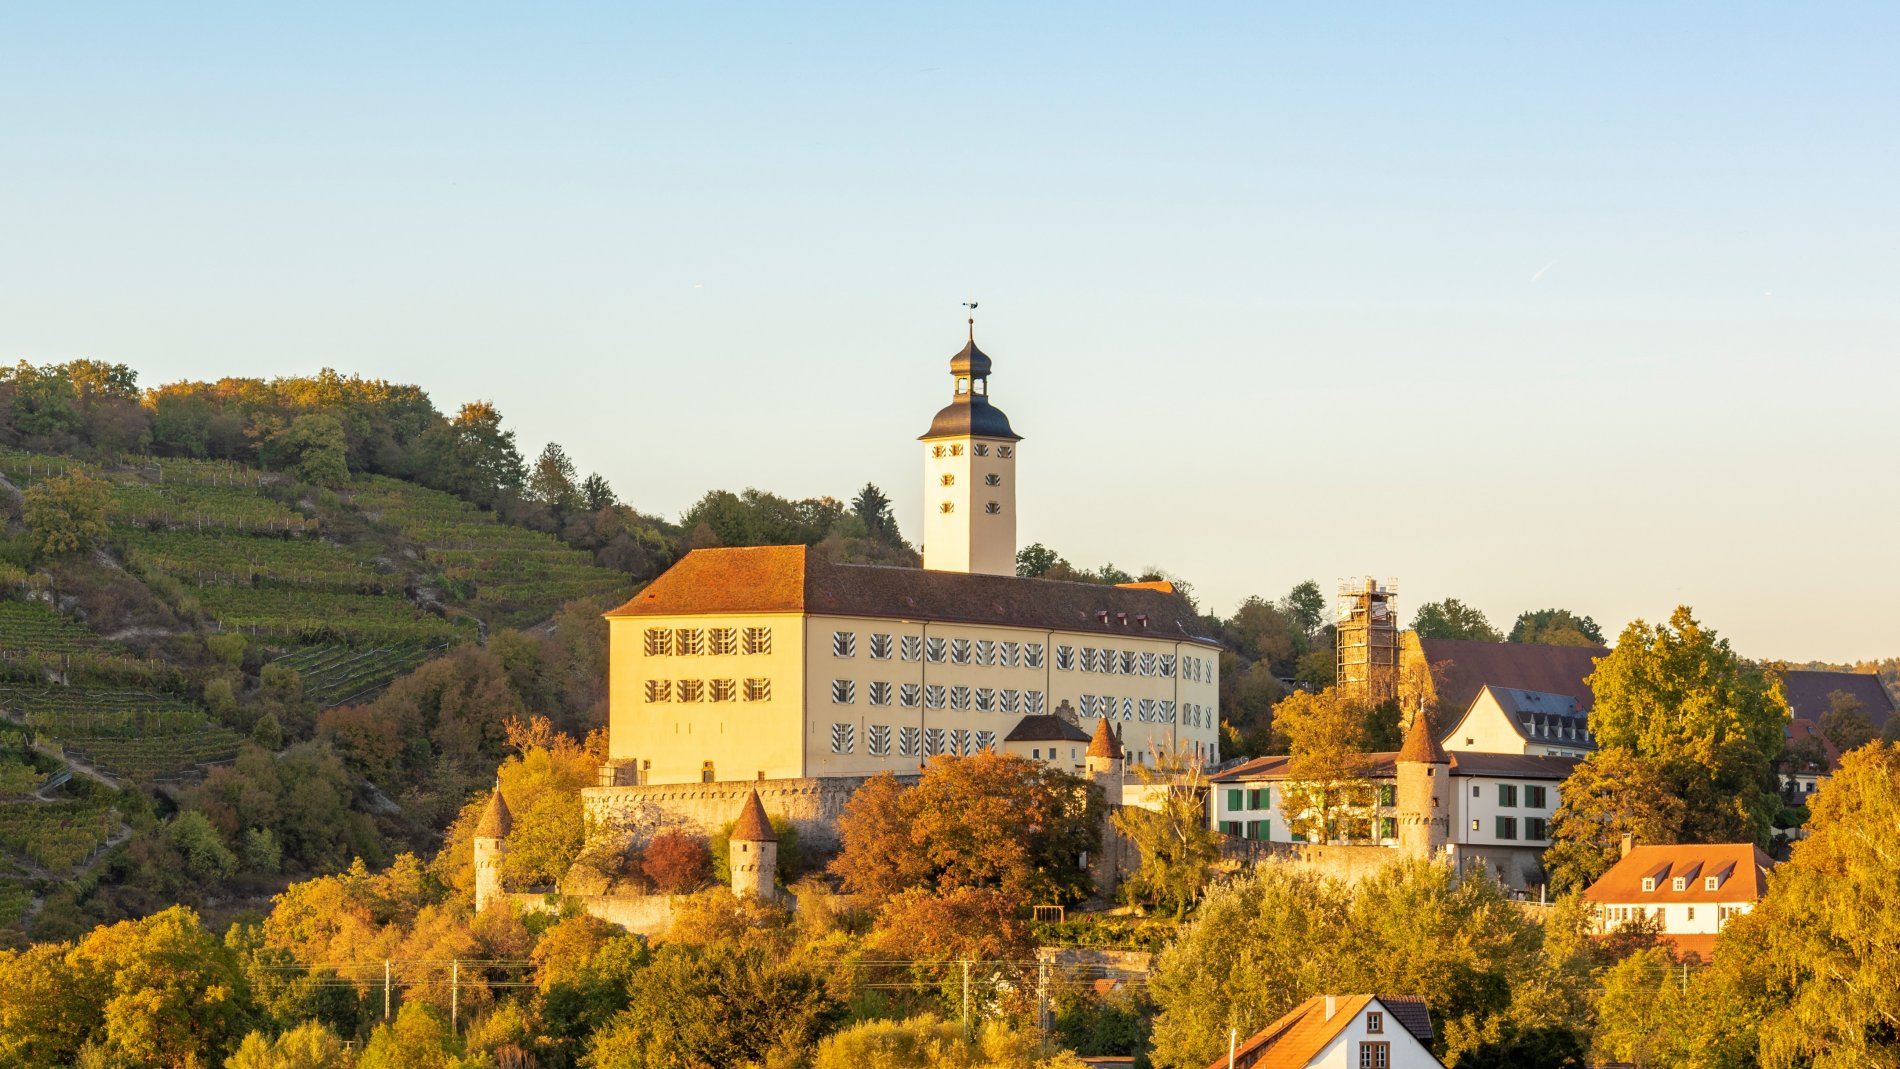 Schloss Horneck Außenansicht   Gundelsheim   HeilbronnerLand